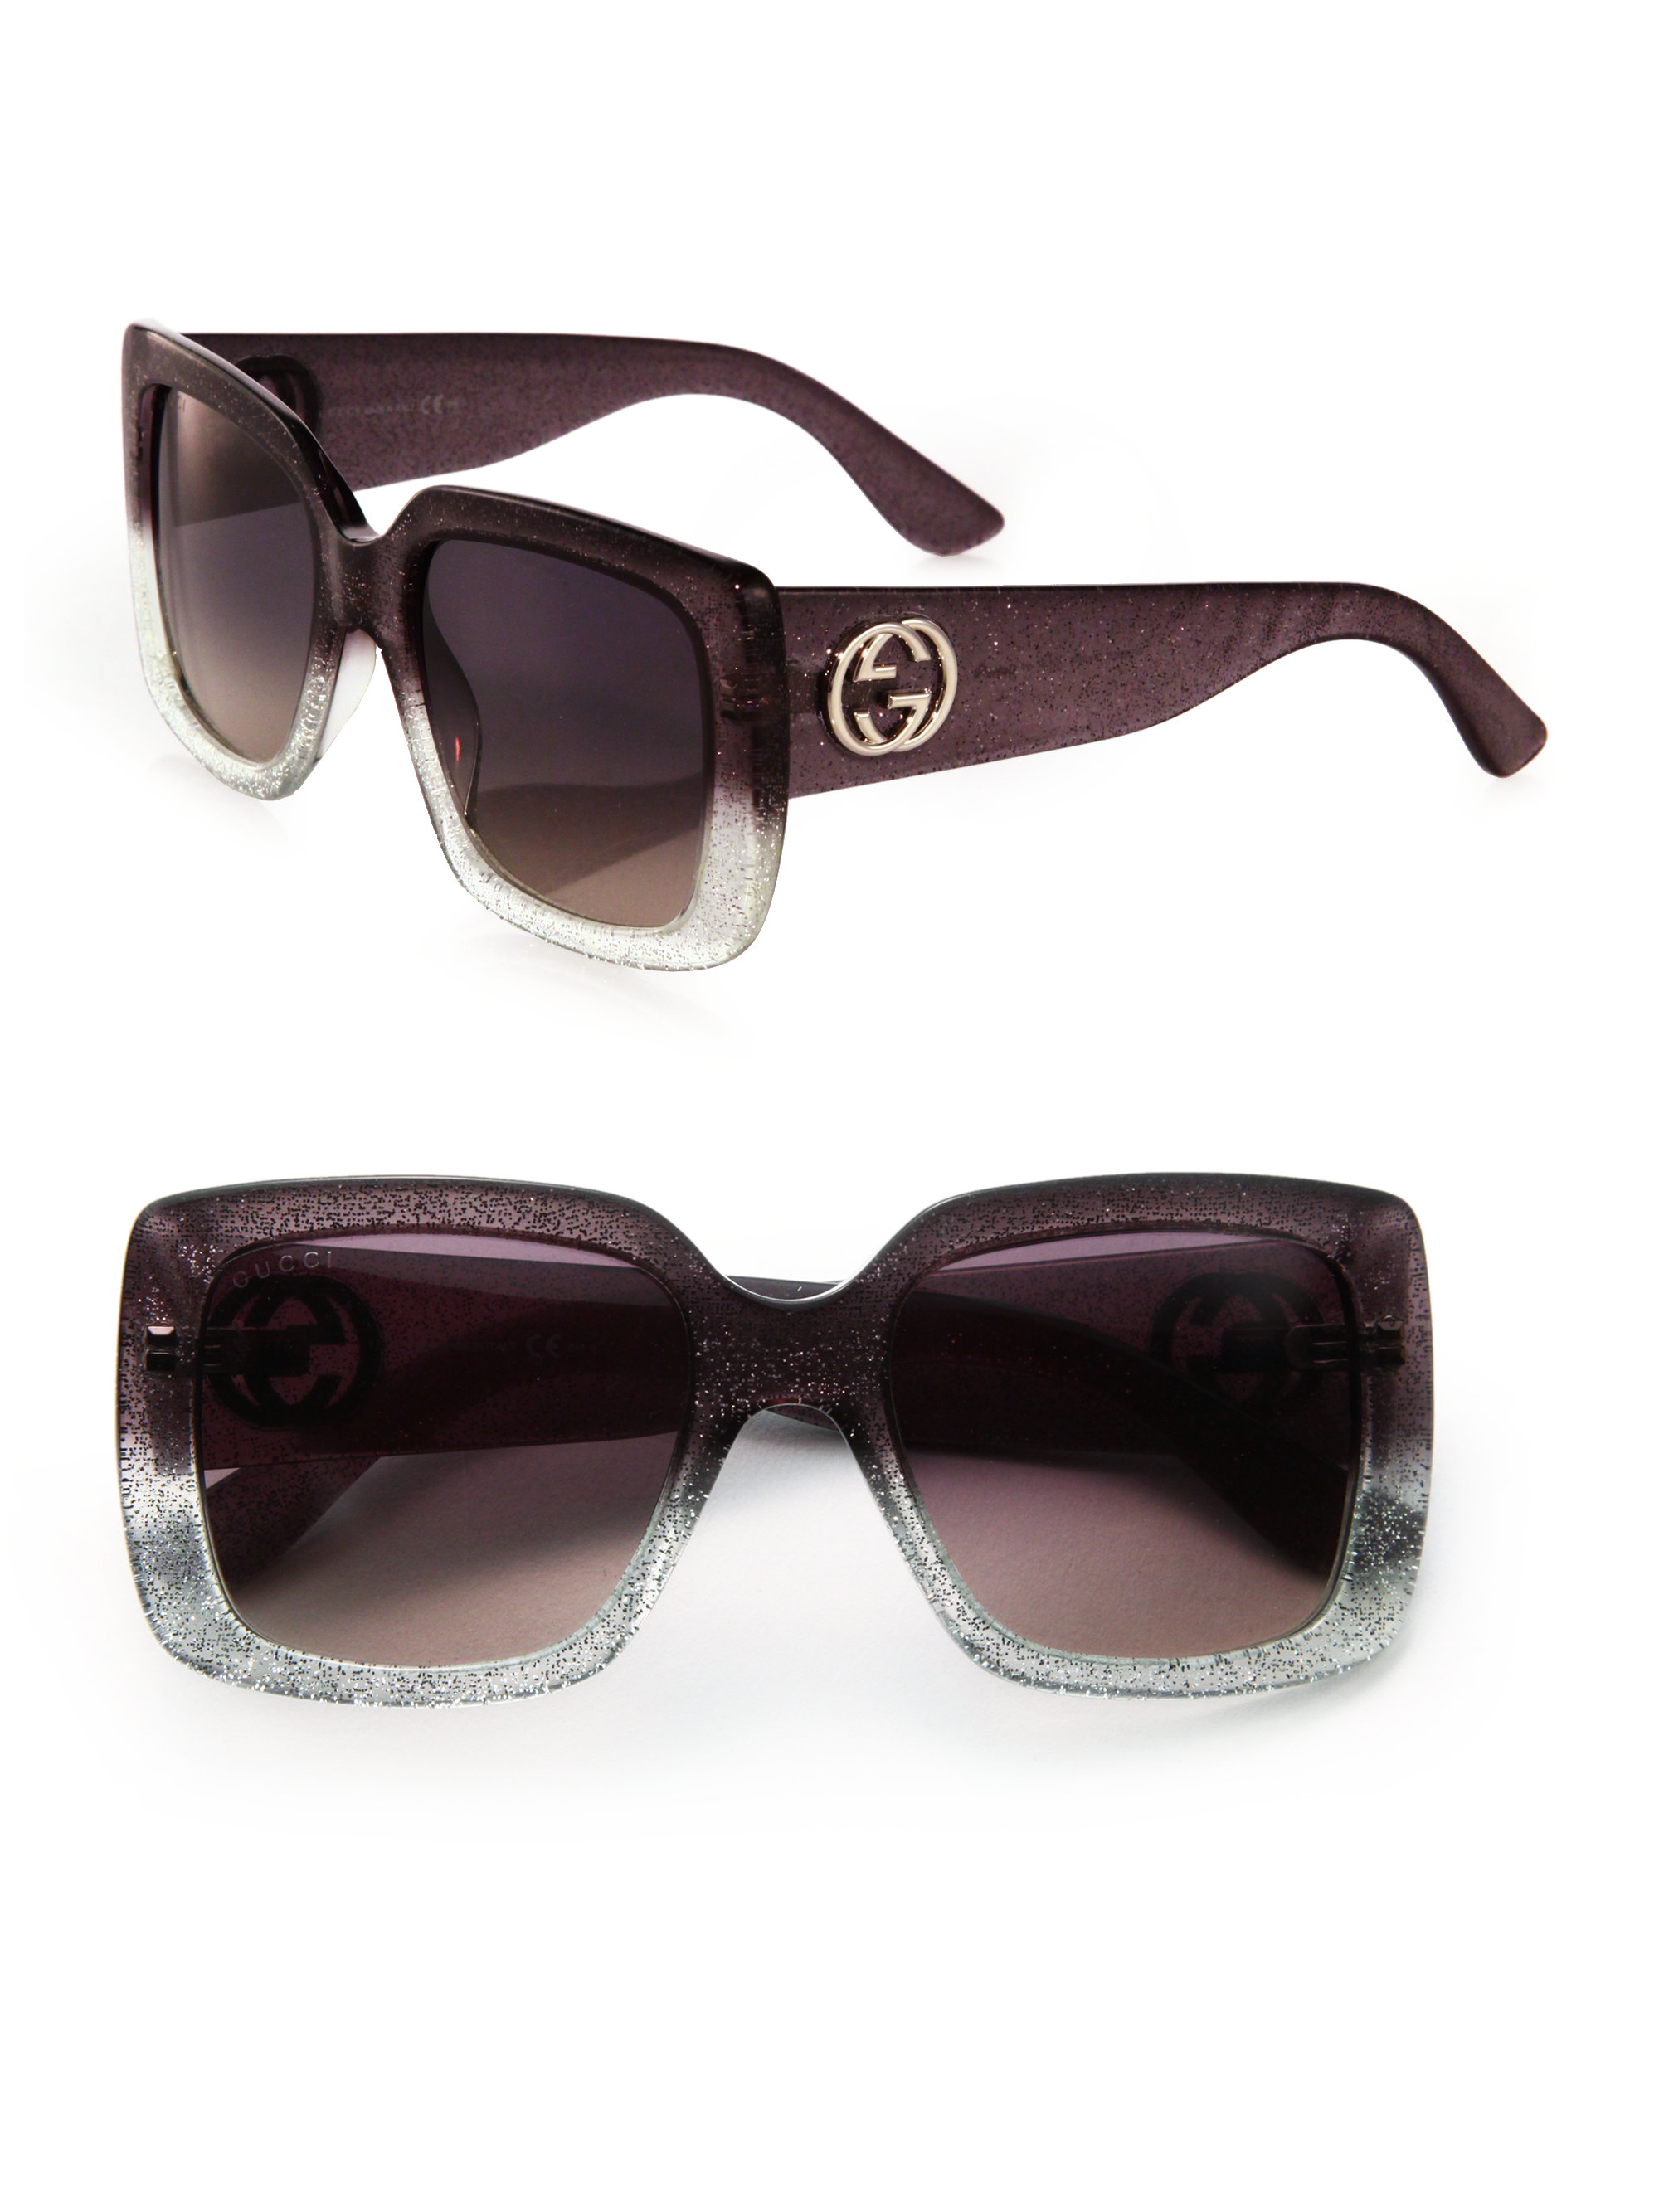 9ad38508a3 Gucci 53mm Oversized Square Glitter Sunglasses in Metallic - Lyst